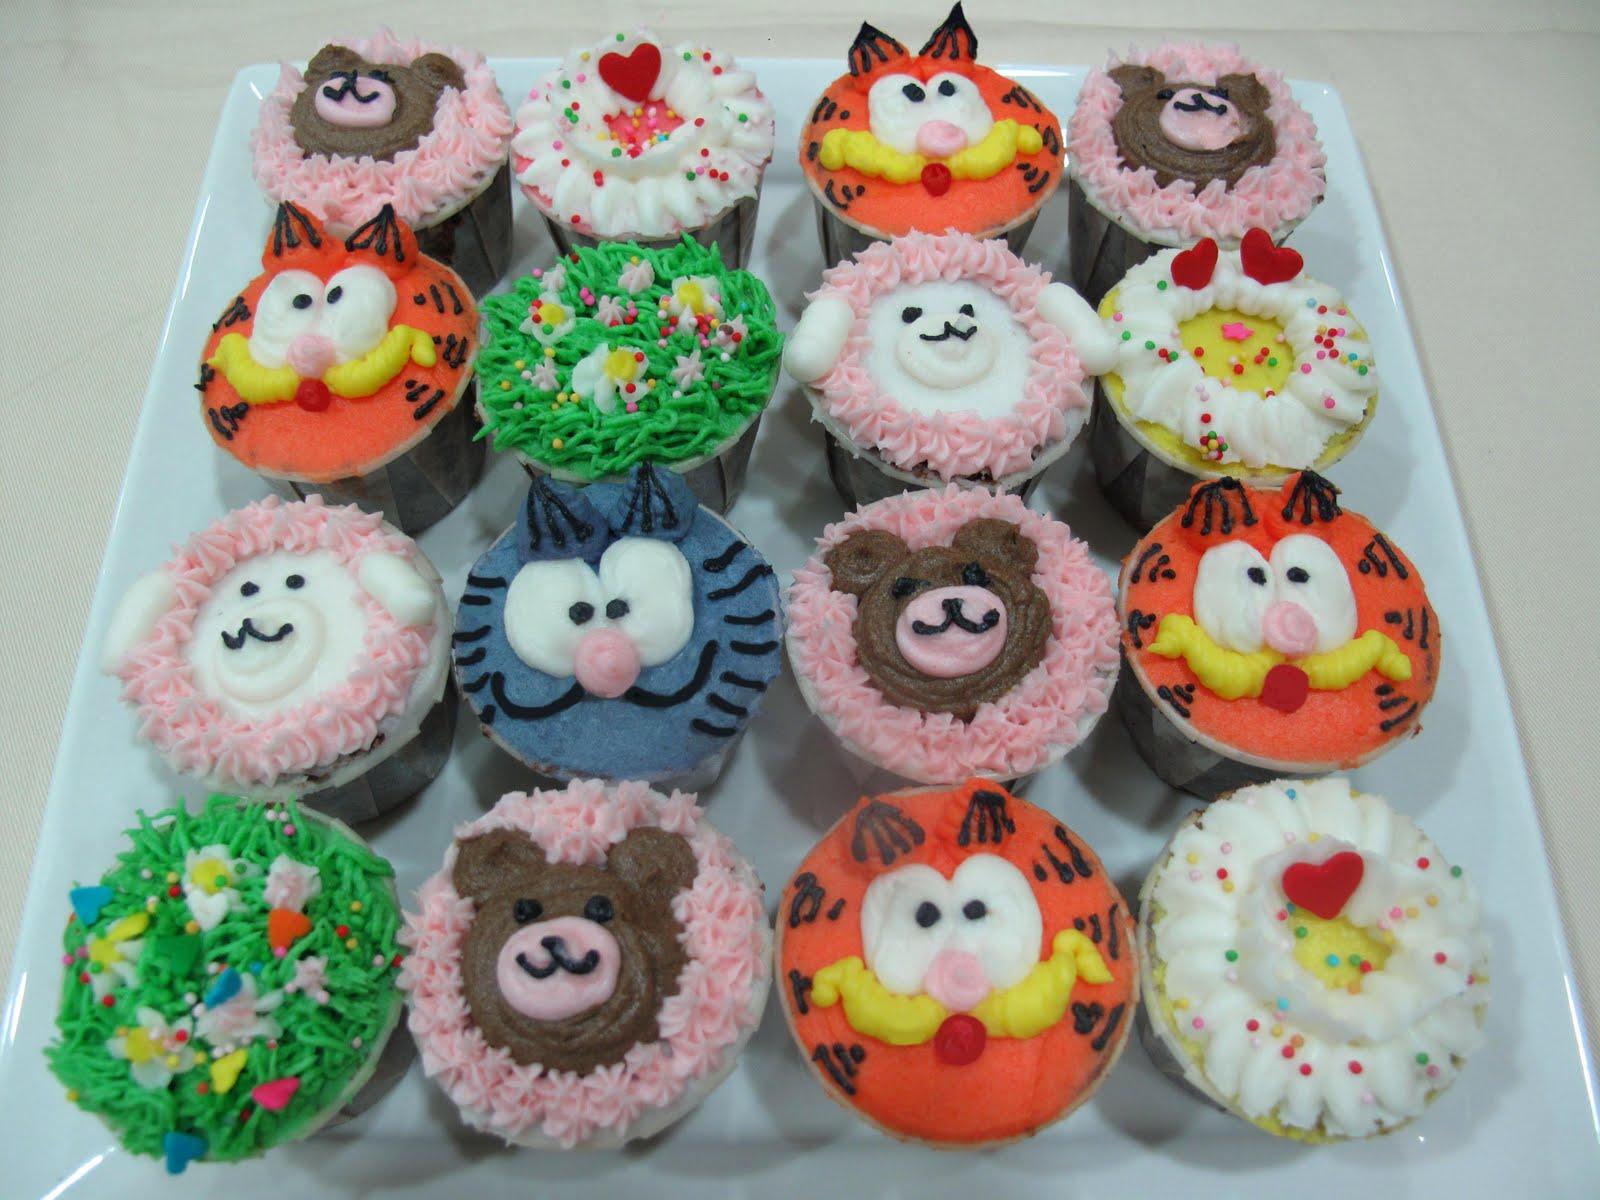 Cake De Lite Your Homemade Cakes In Kuala Lumpur Kl Pj